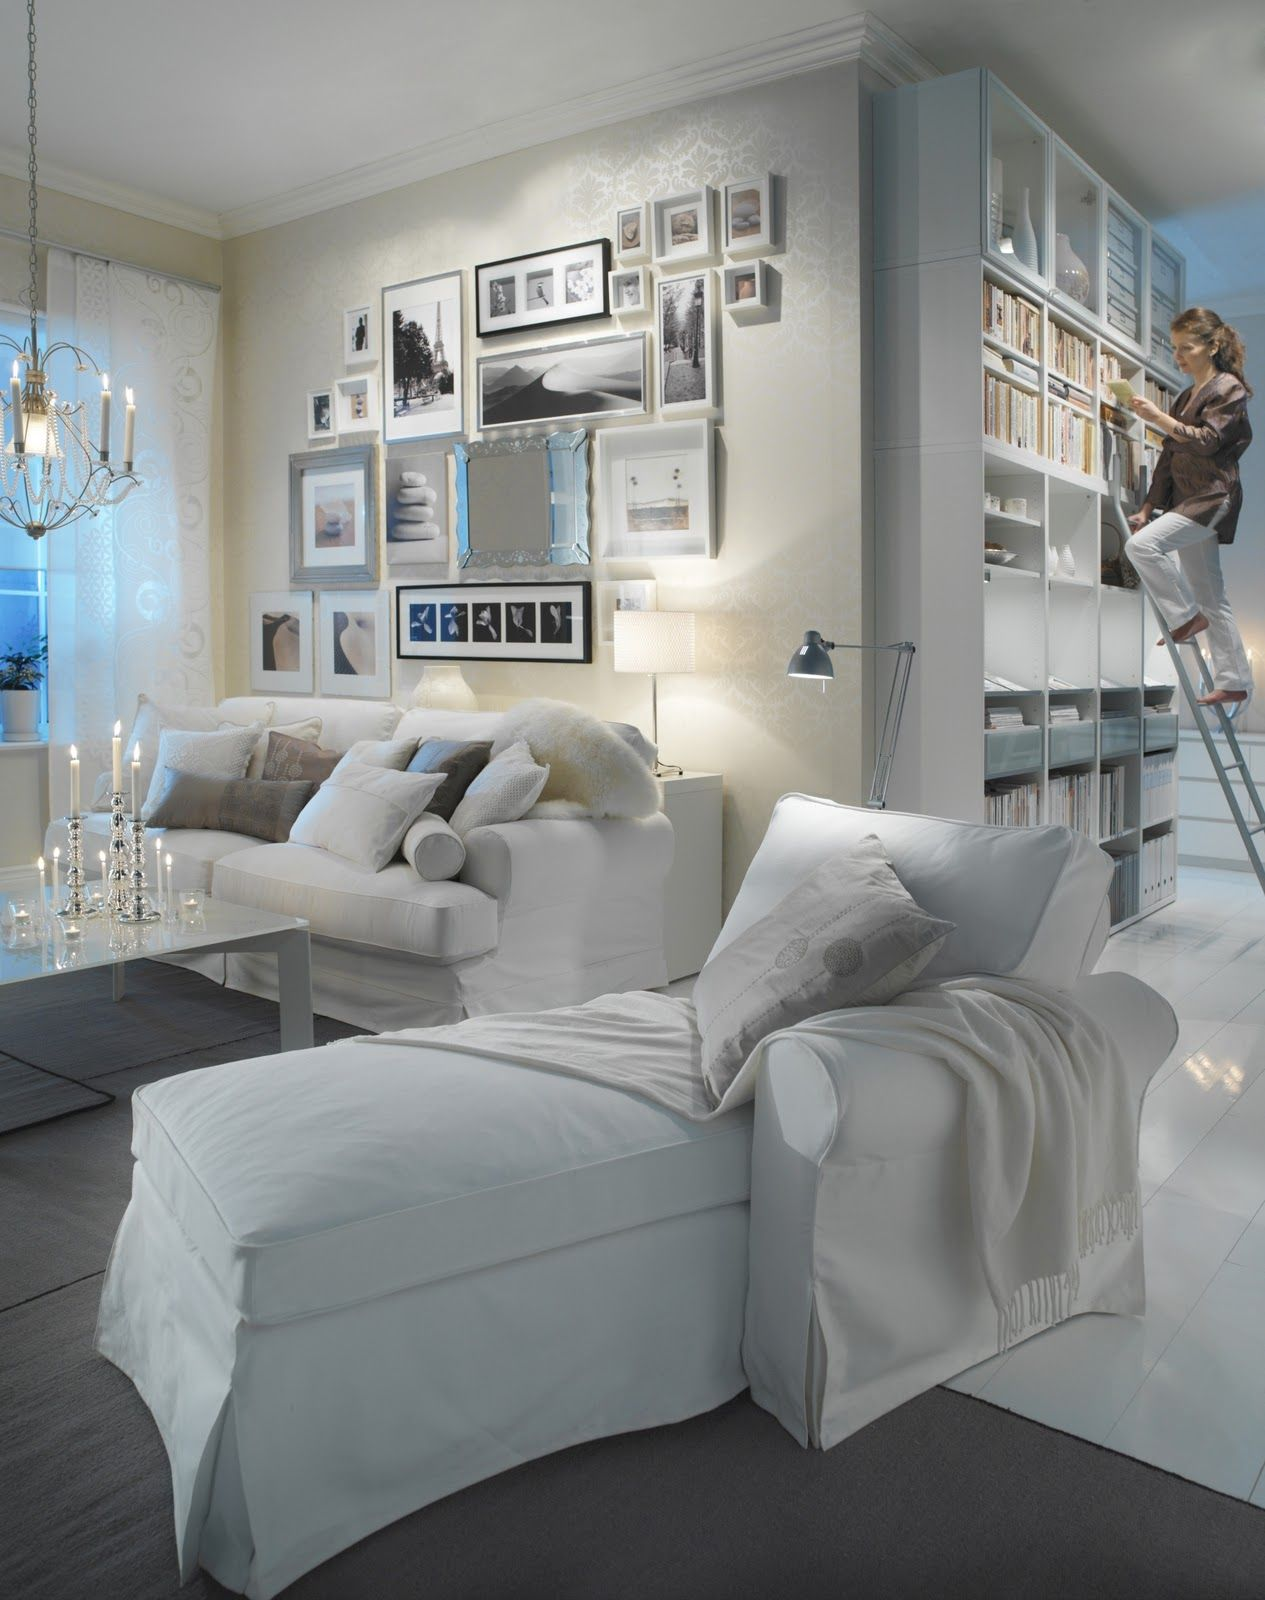 Living Room Design Ikea: Ver.lieb.te: Neues Wohnzimmer